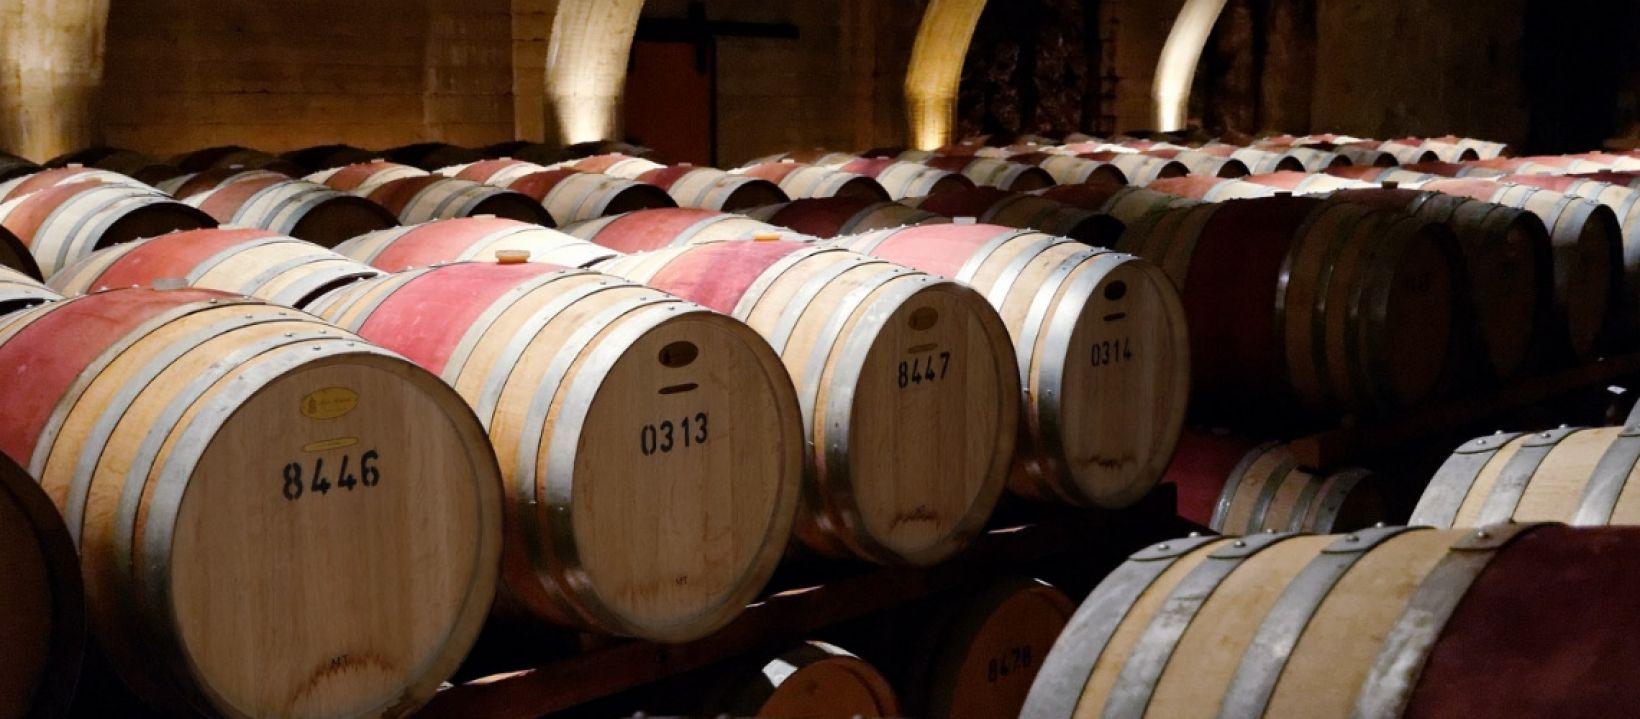 Photo for: Bulk Wine Financial Benchmarks